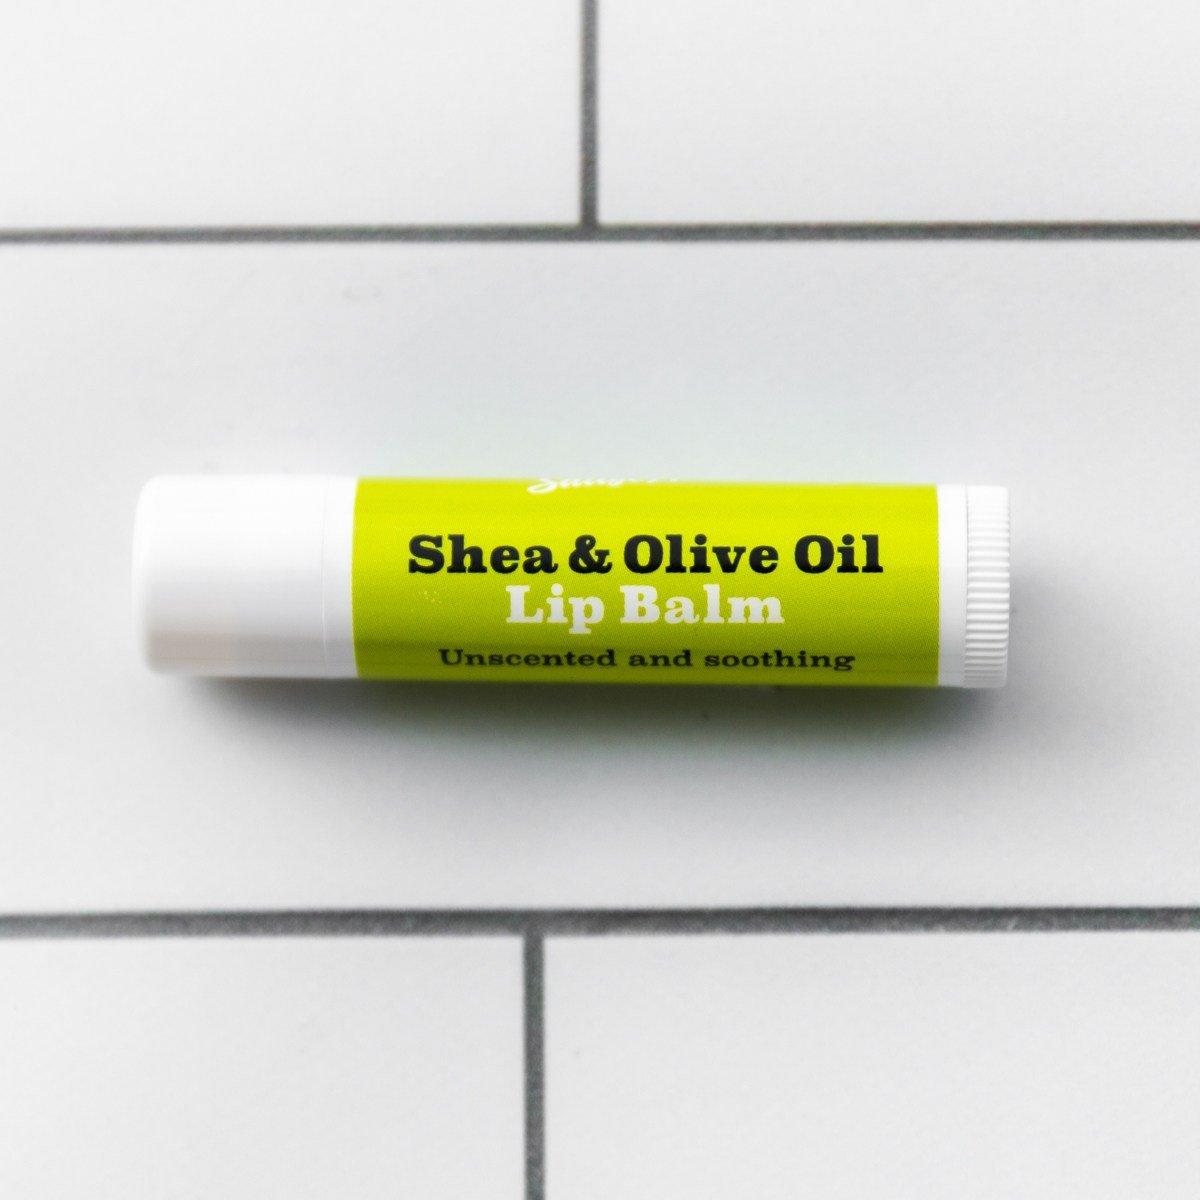 Shea and Olive Oil Lip Balm